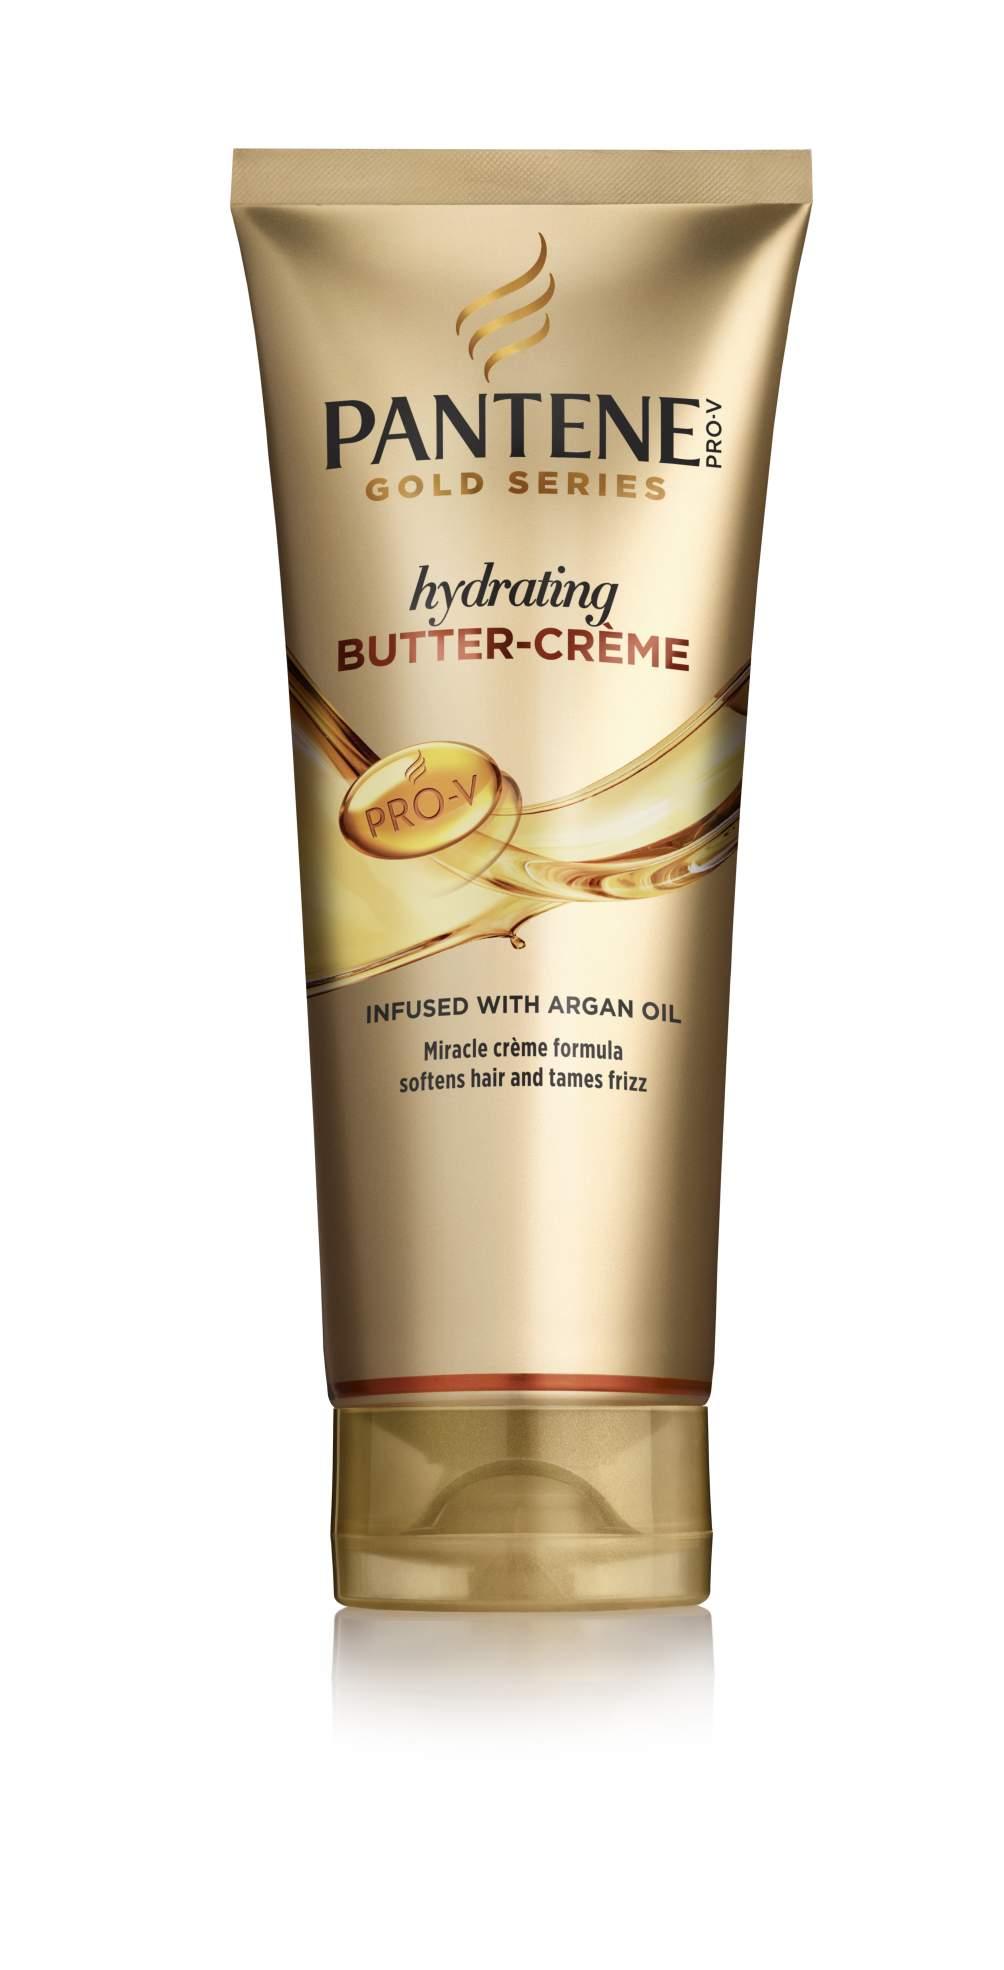 Pantene Pro-V Gold Series Hydrating Butter Crème